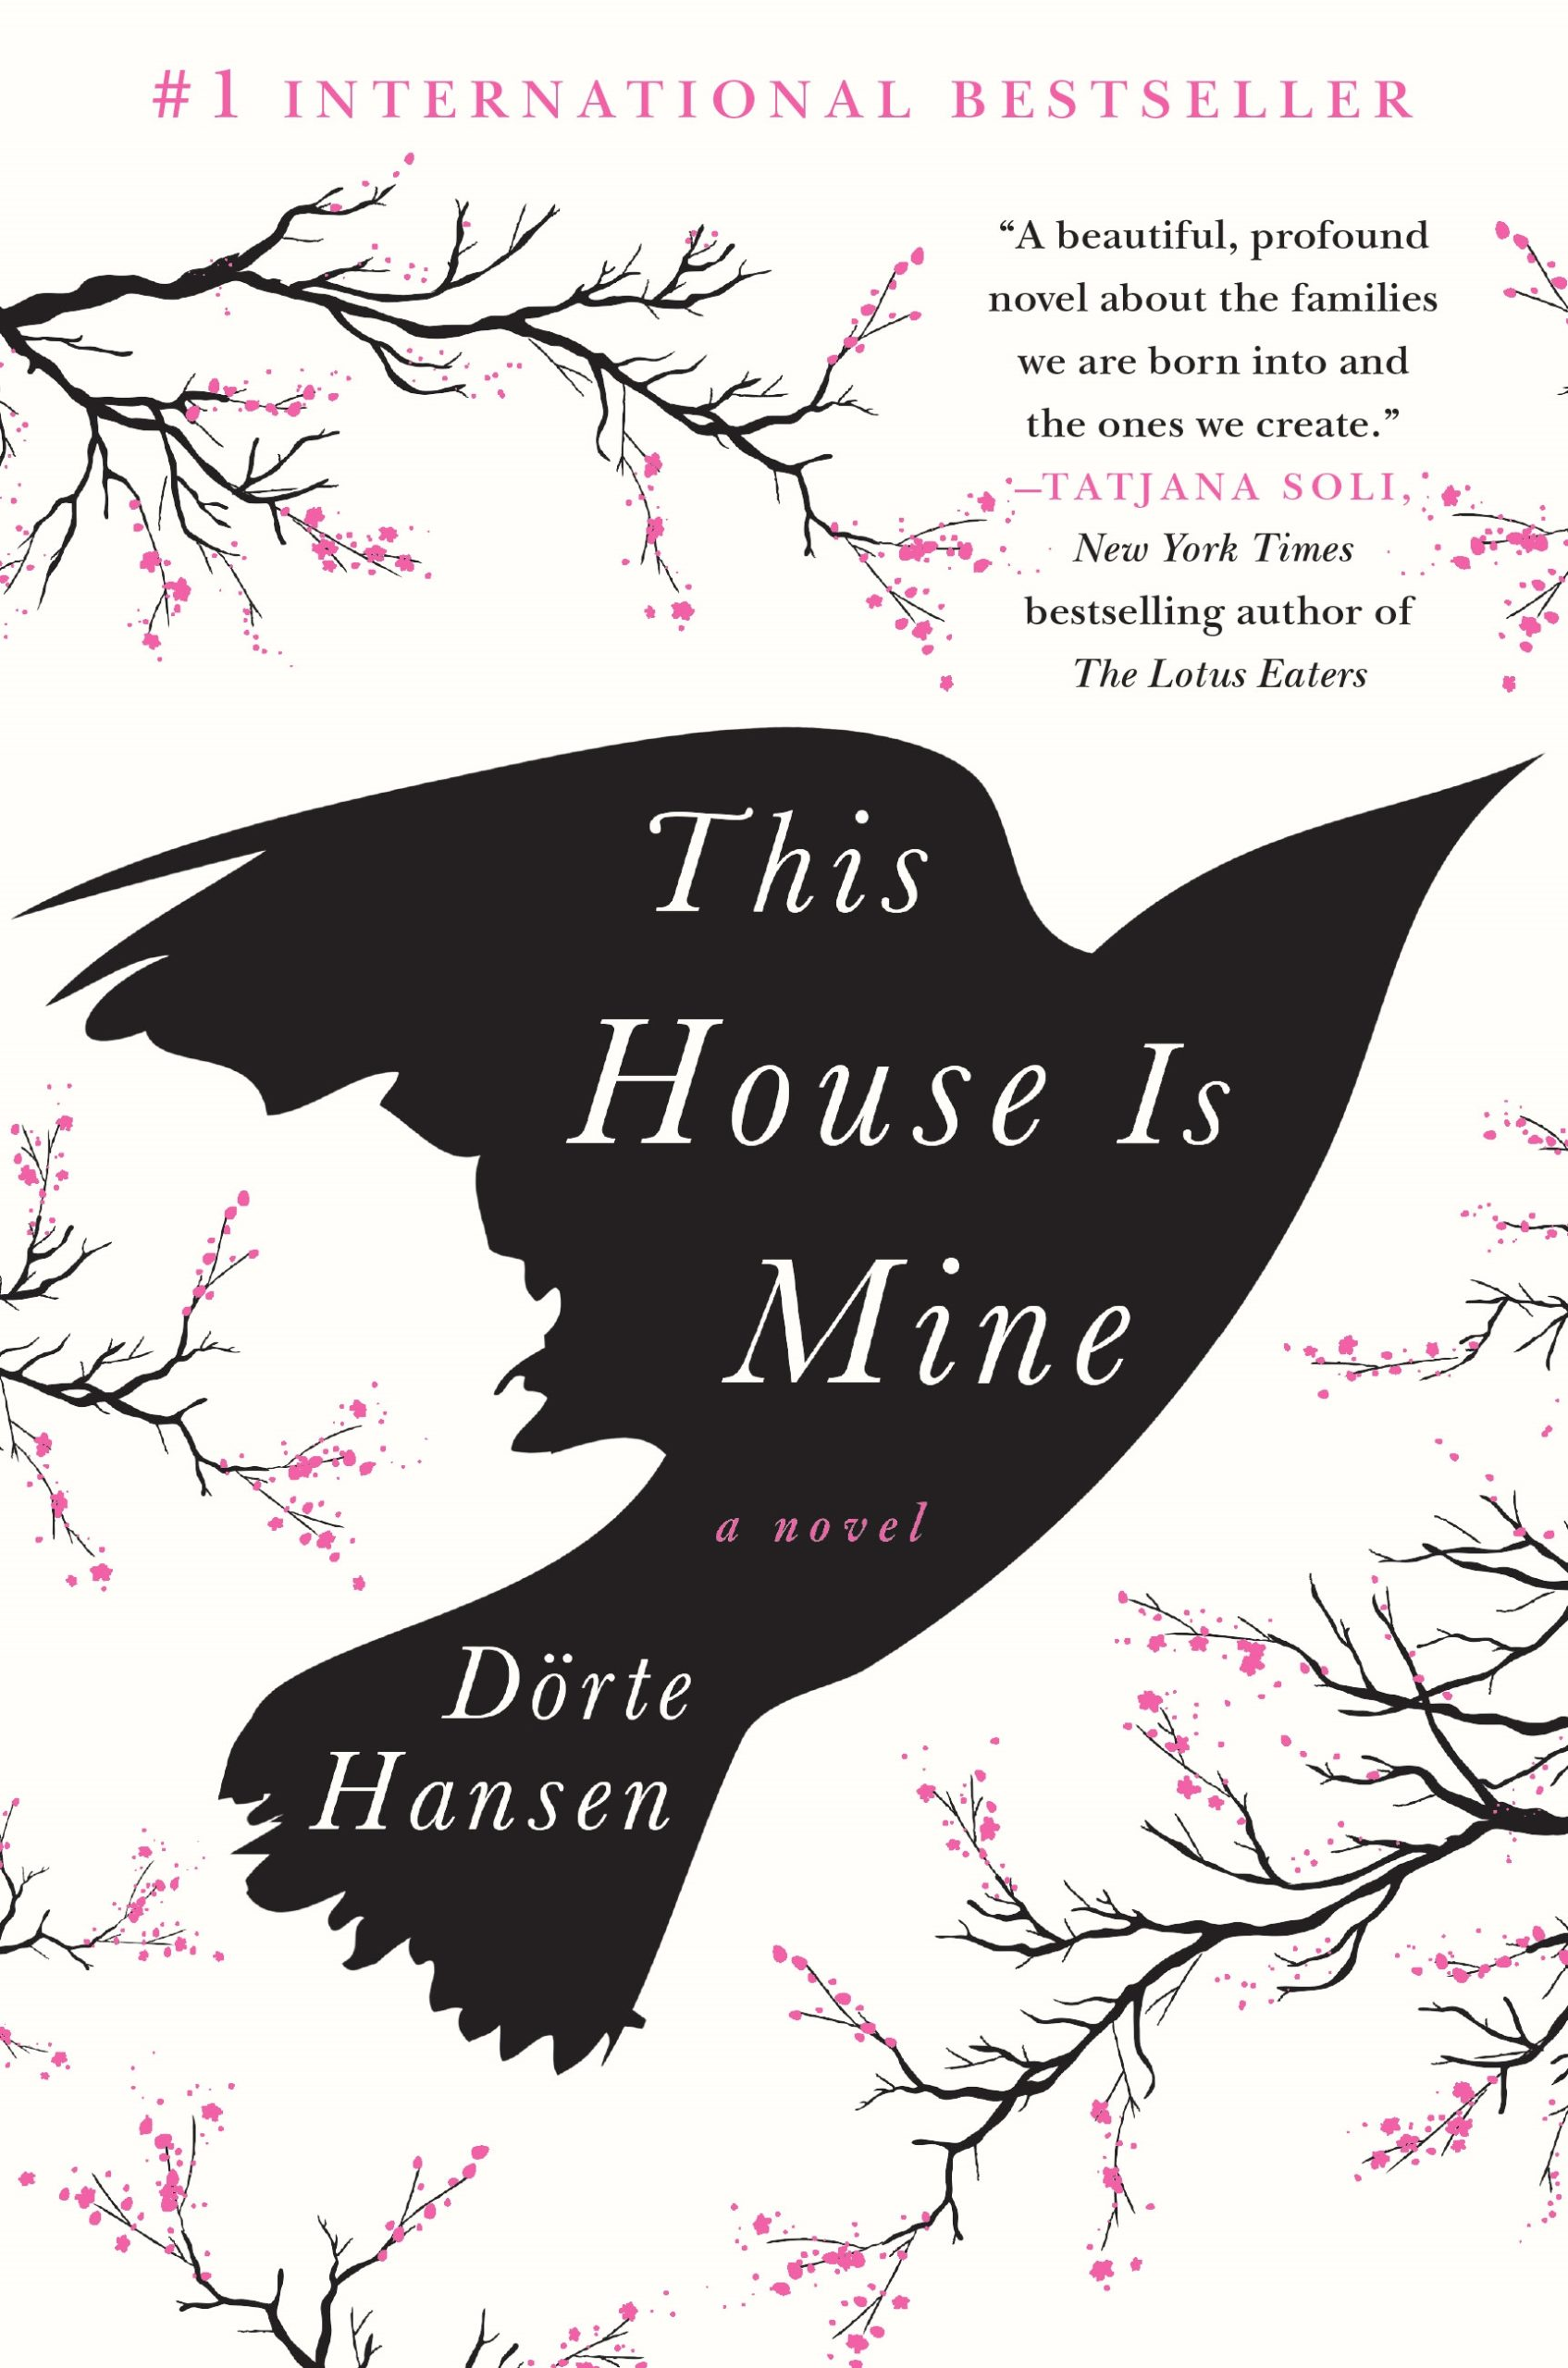 Hansen - cover